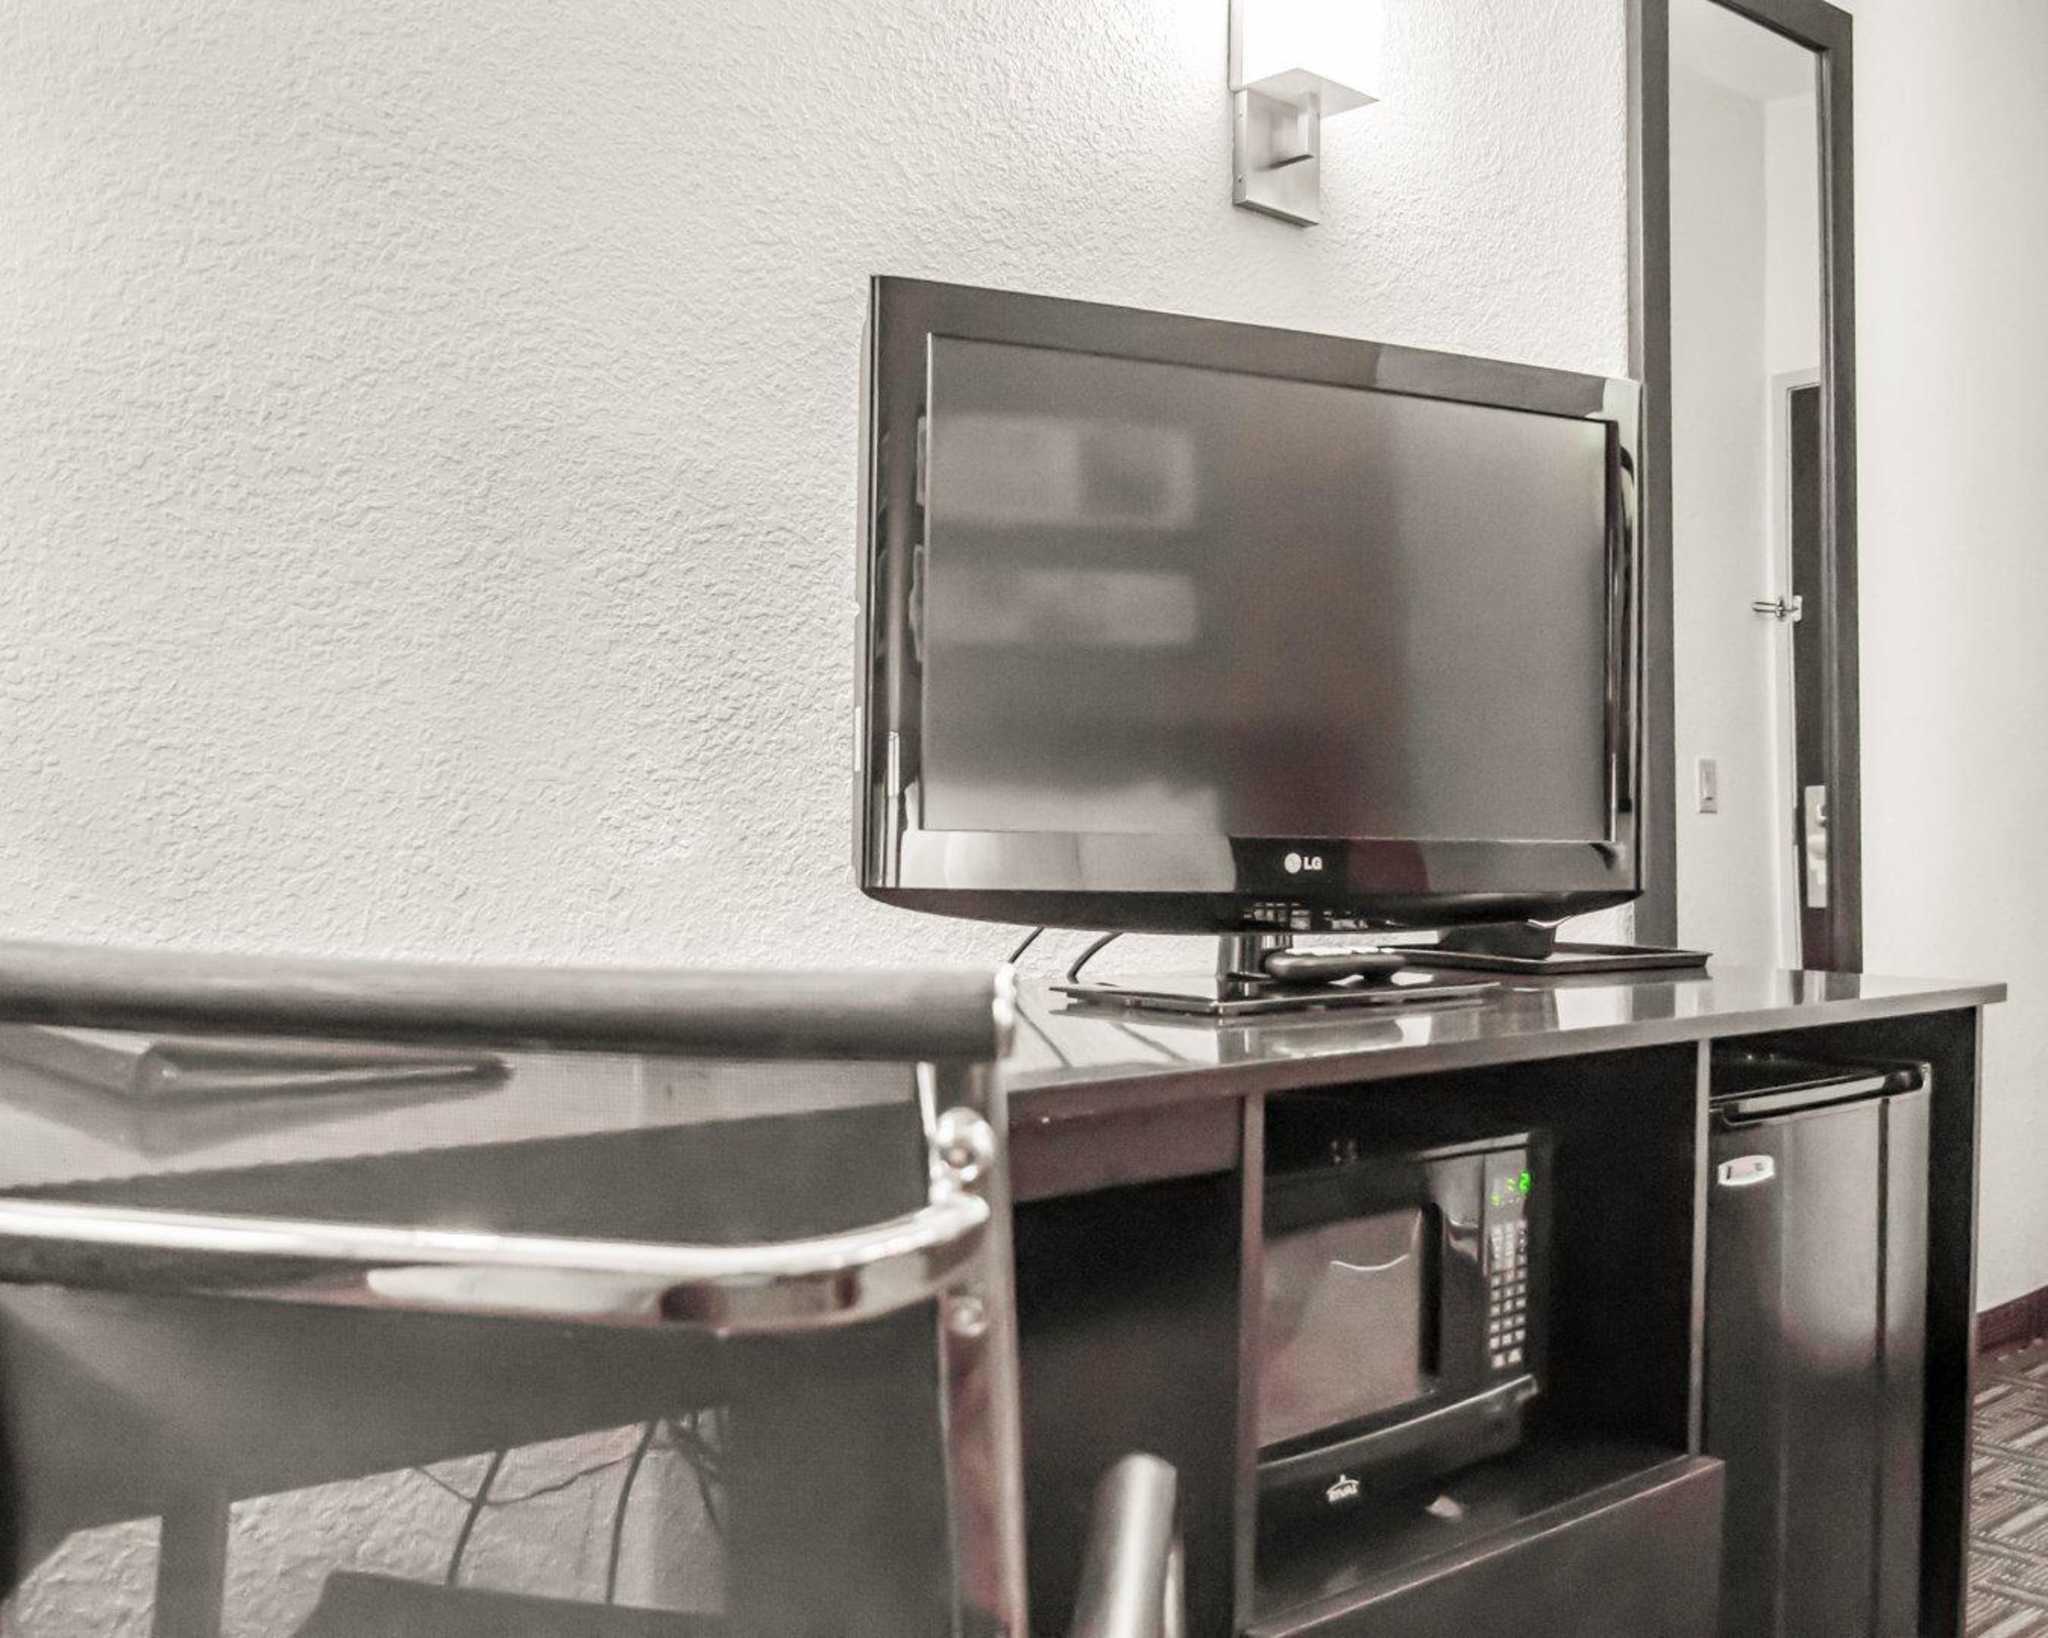 jack schmitt chevrolet of ofallon st louis chevrolet autos post. Black Bedroom Furniture Sets. Home Design Ideas